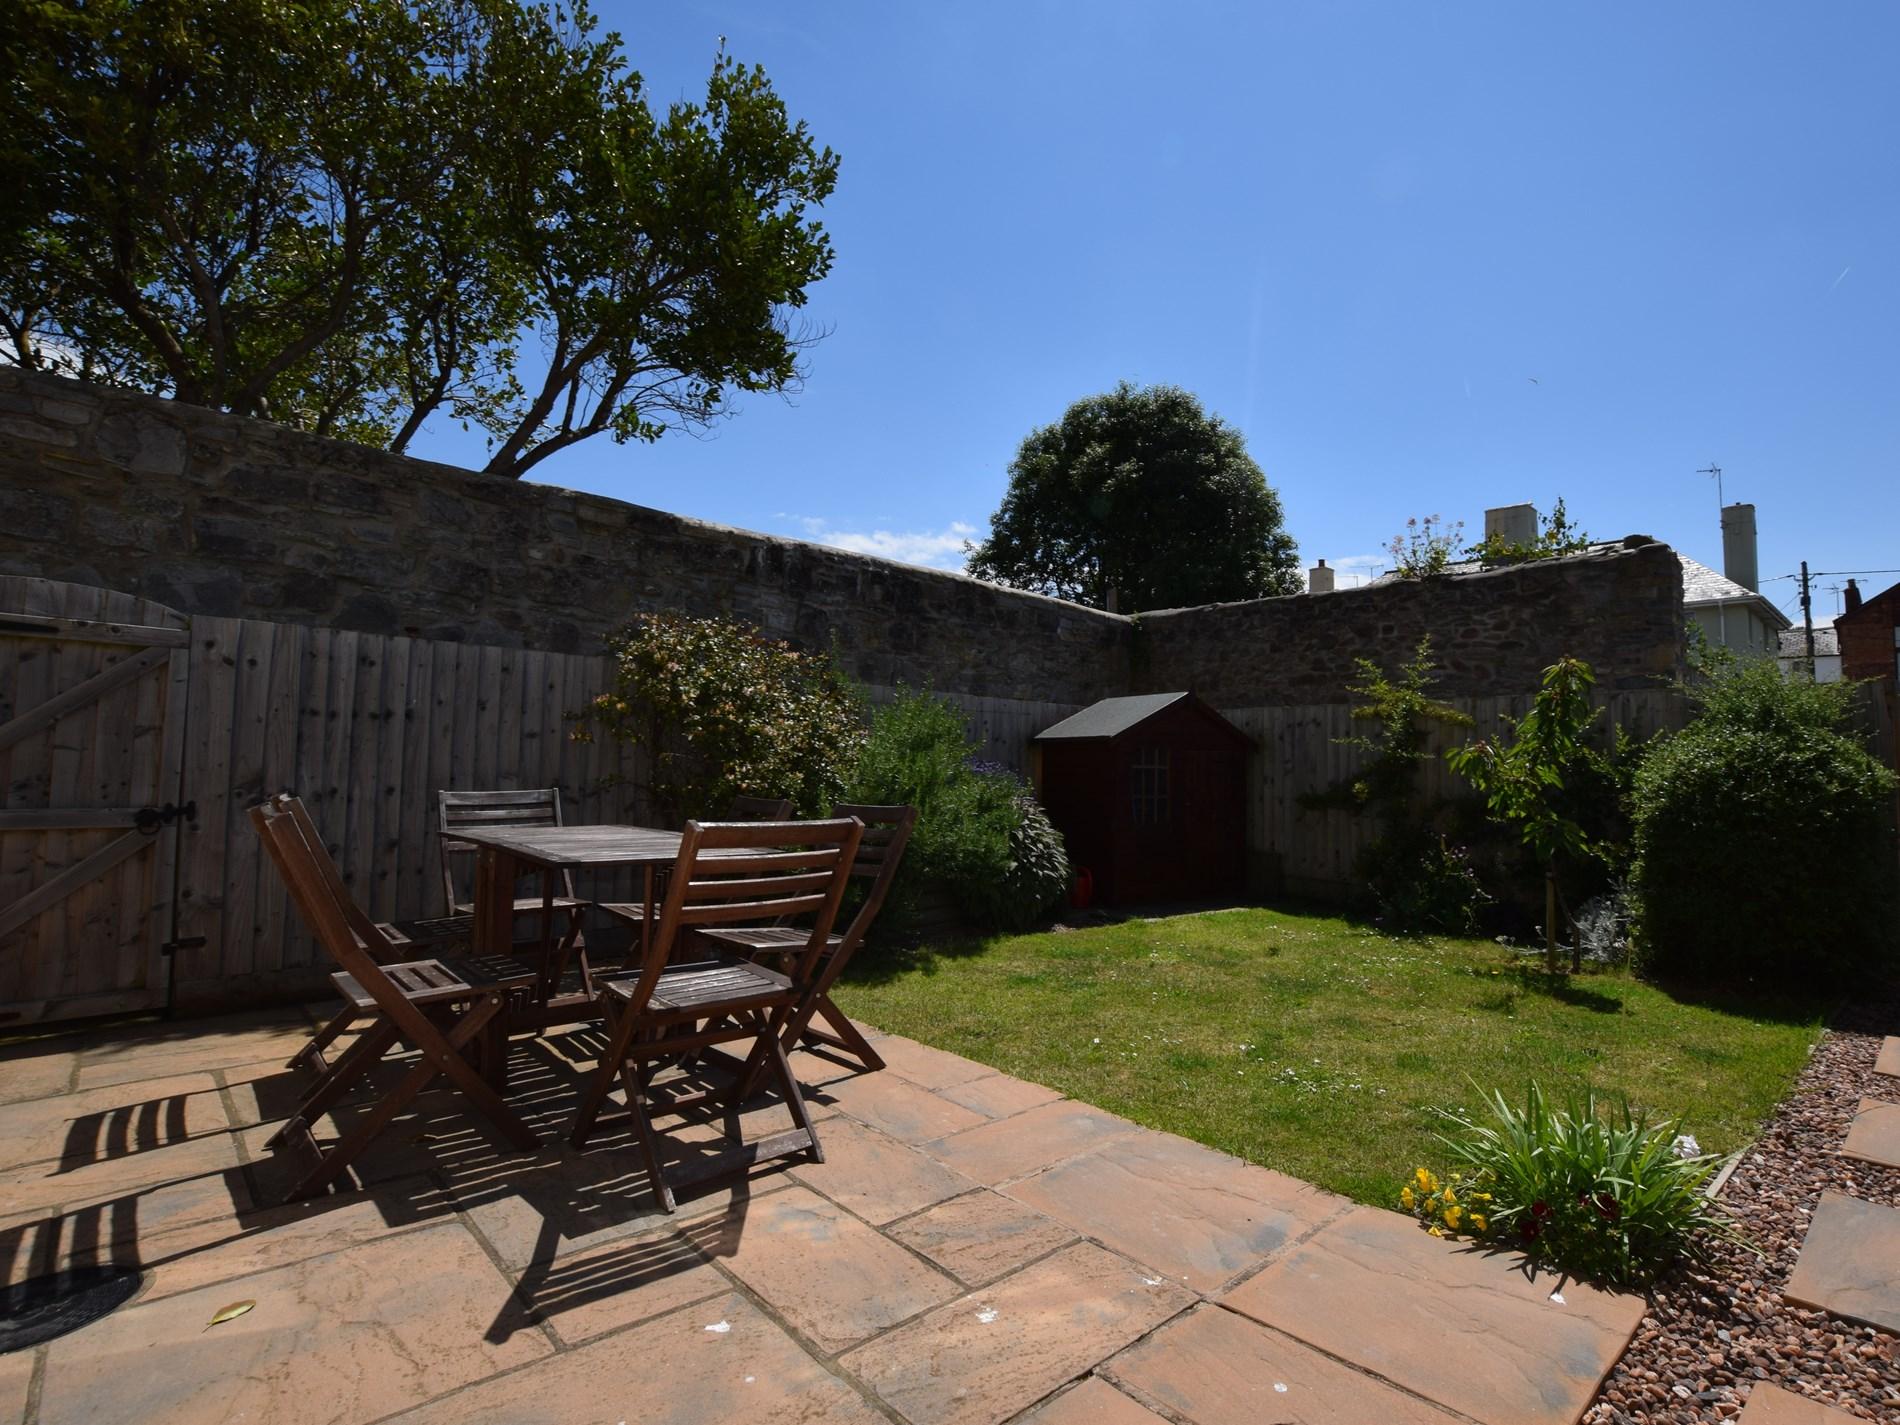 3 Bedroom House in Somerset, Dorset and Somerset